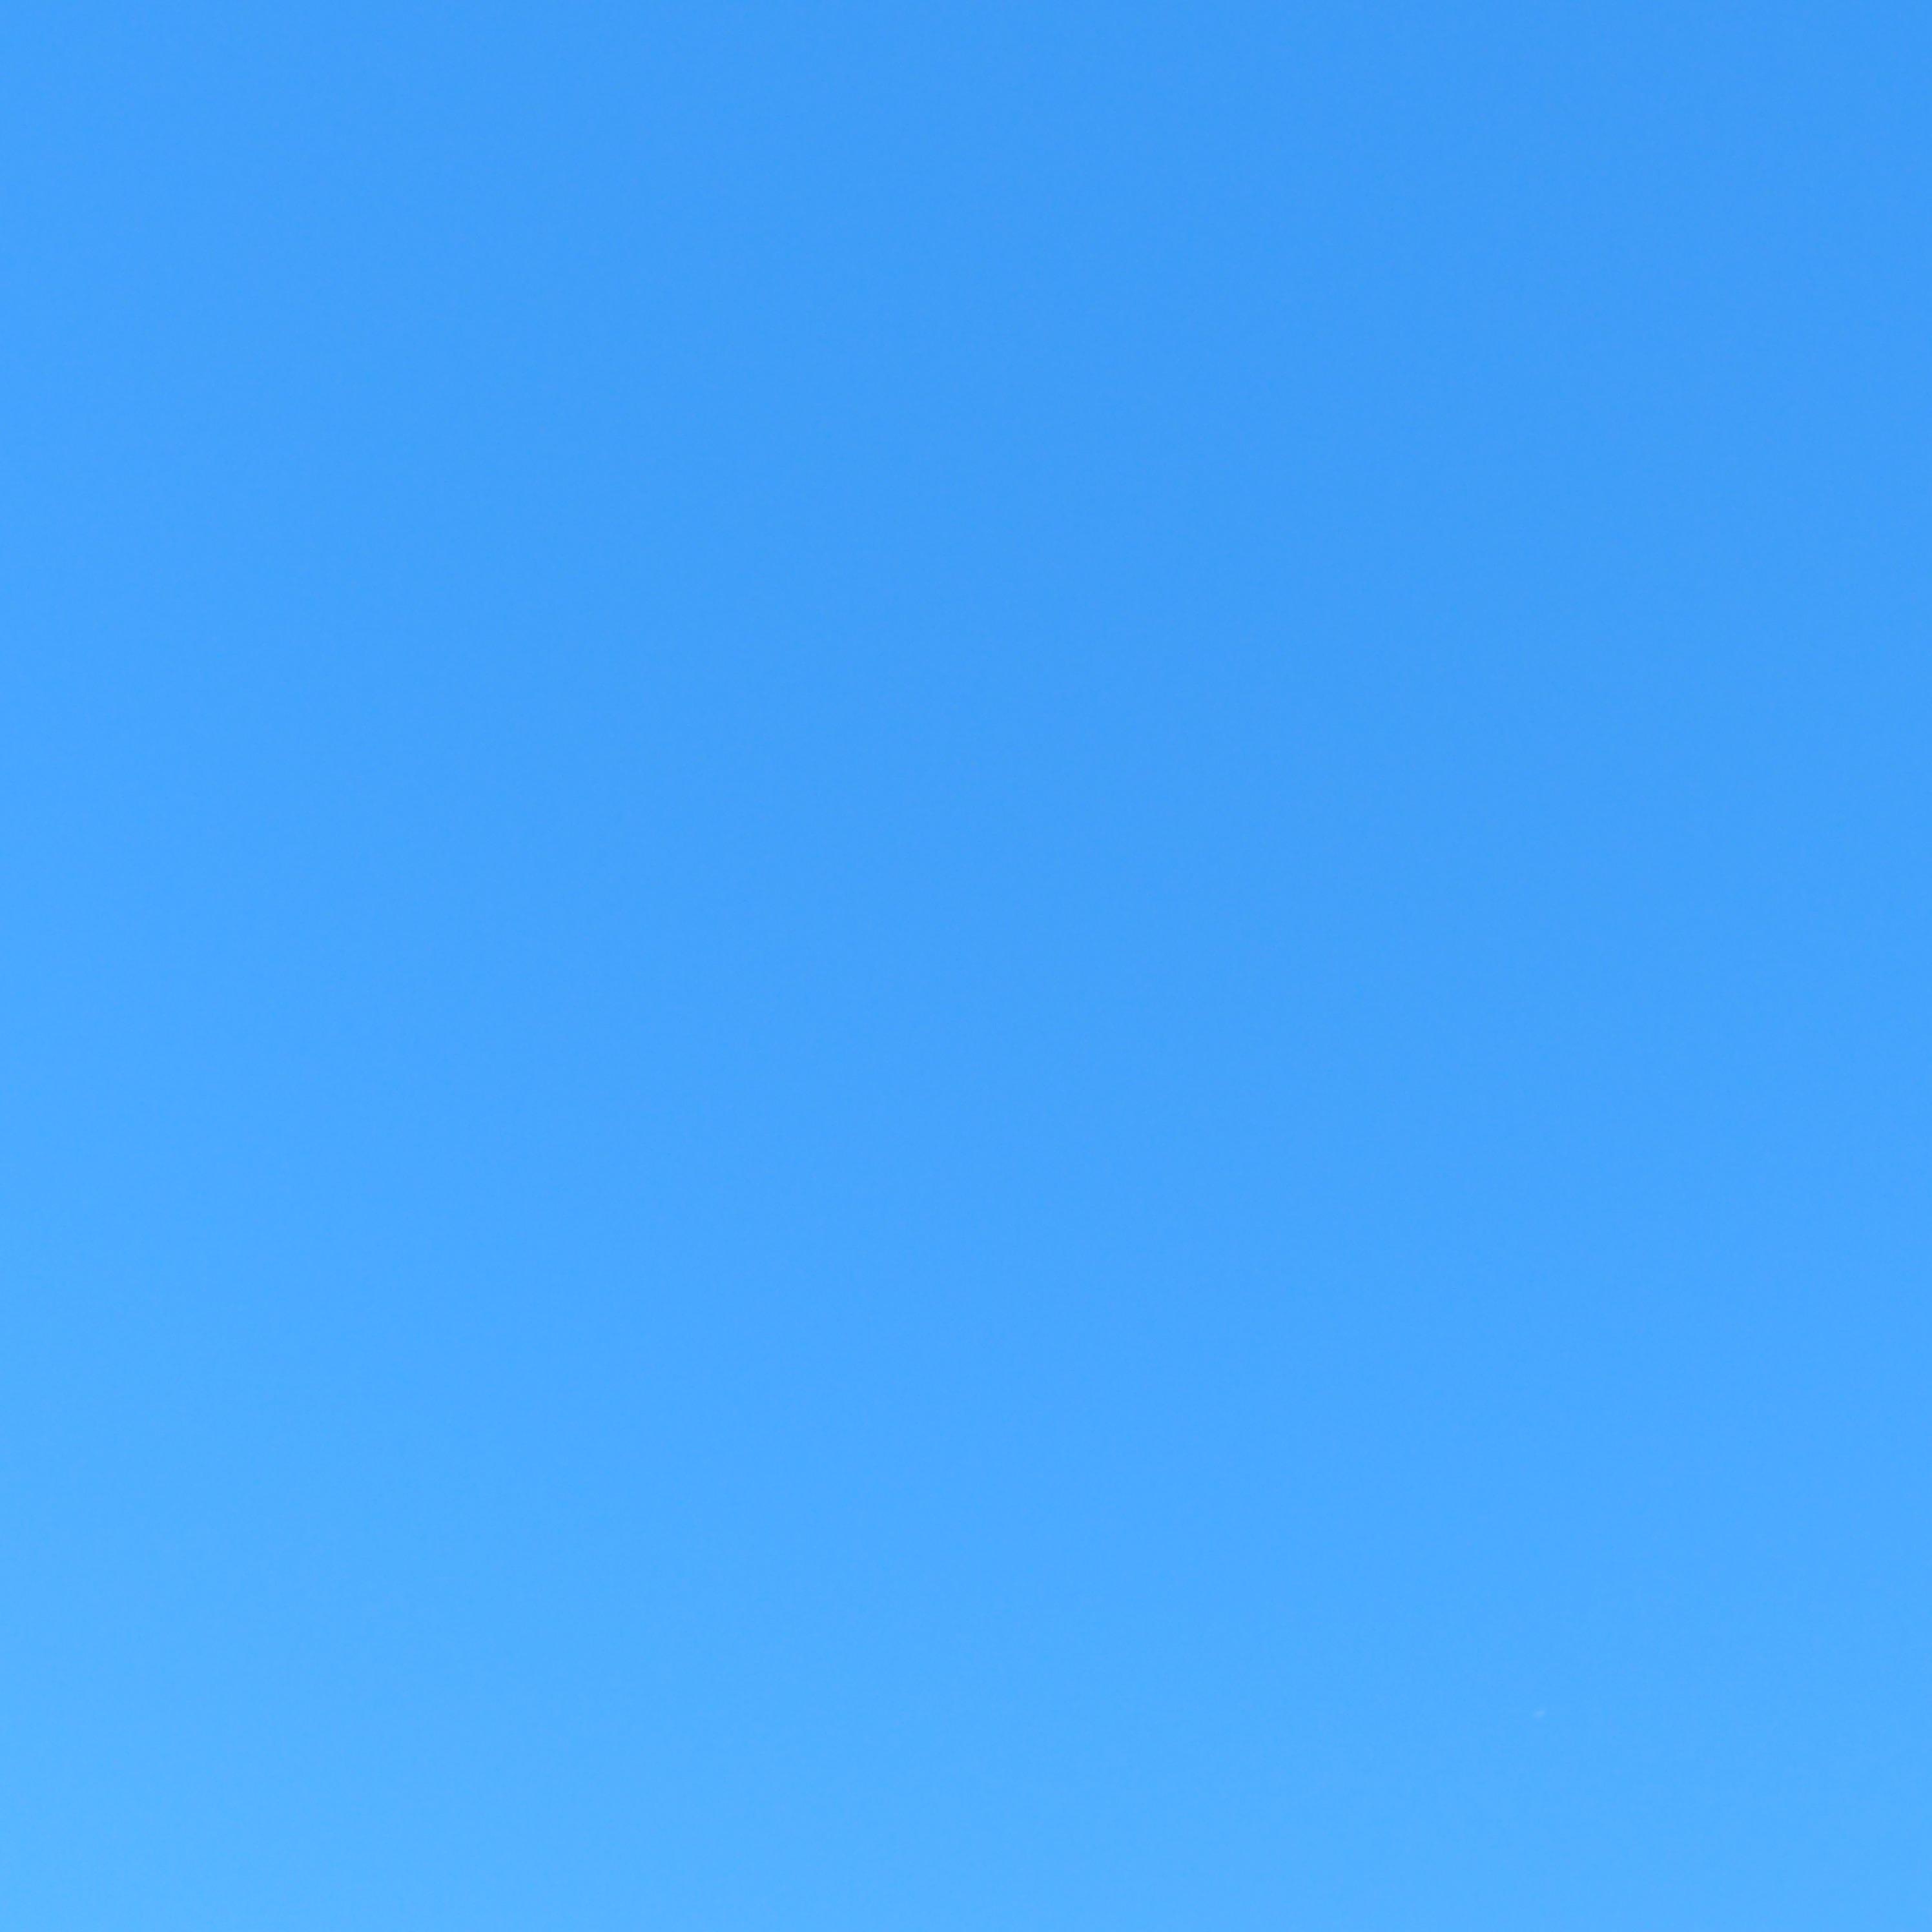 Horizon Light Cloud Sky Atmosphere Daytime Line Blue Background Image Azure Wallpaper Strong Bright